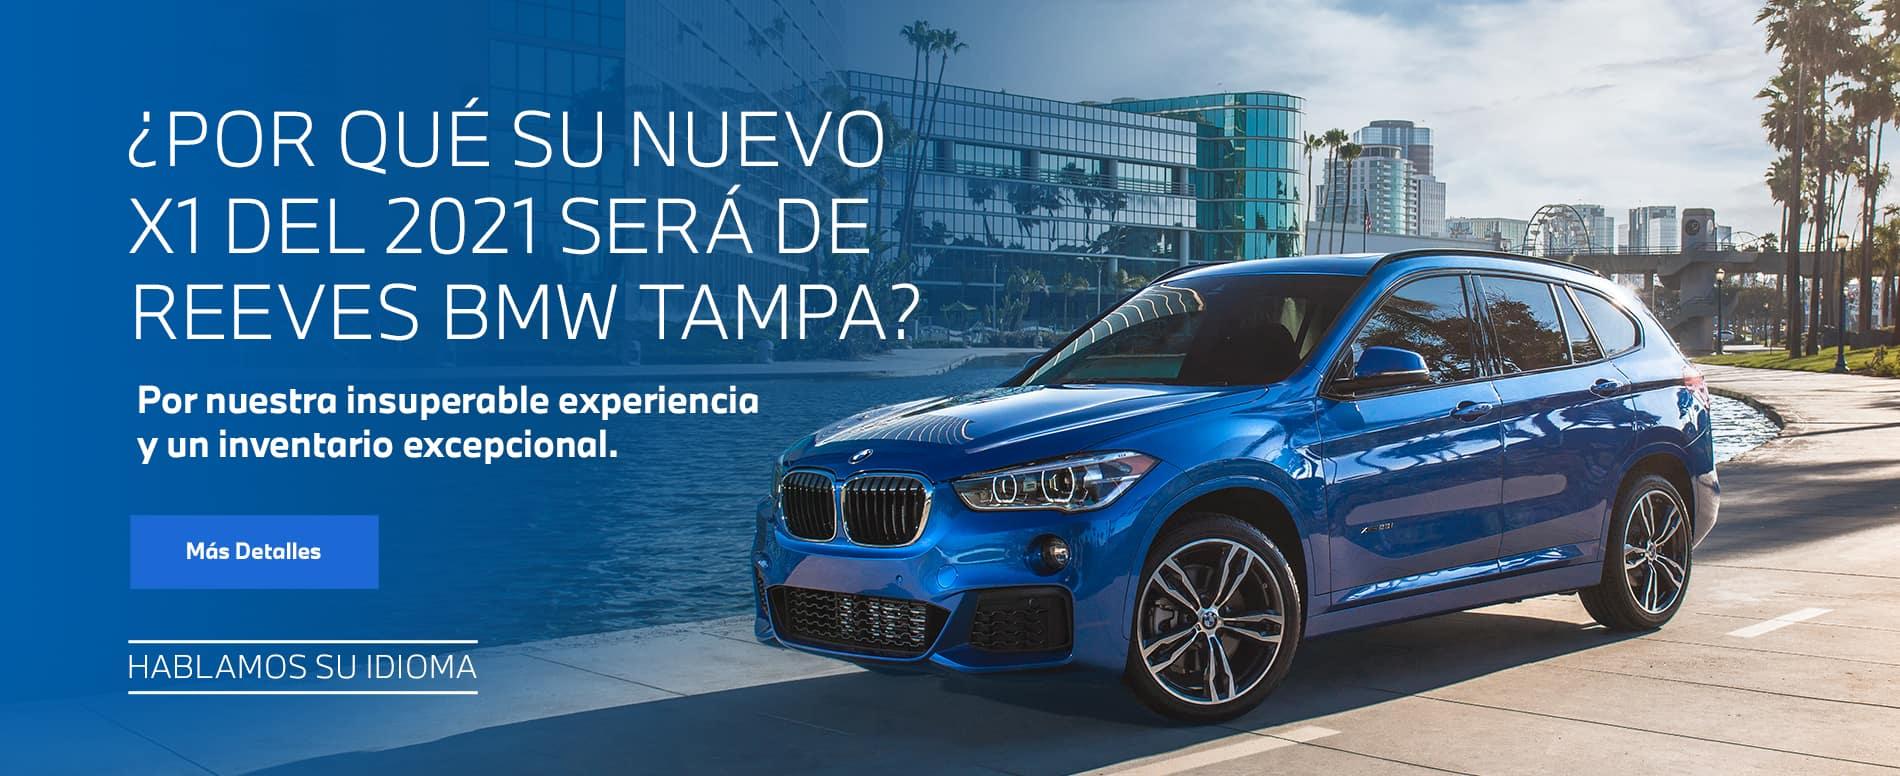 BMW-X1-WhyChooseReeves-Spanish-June-Webslide-Final